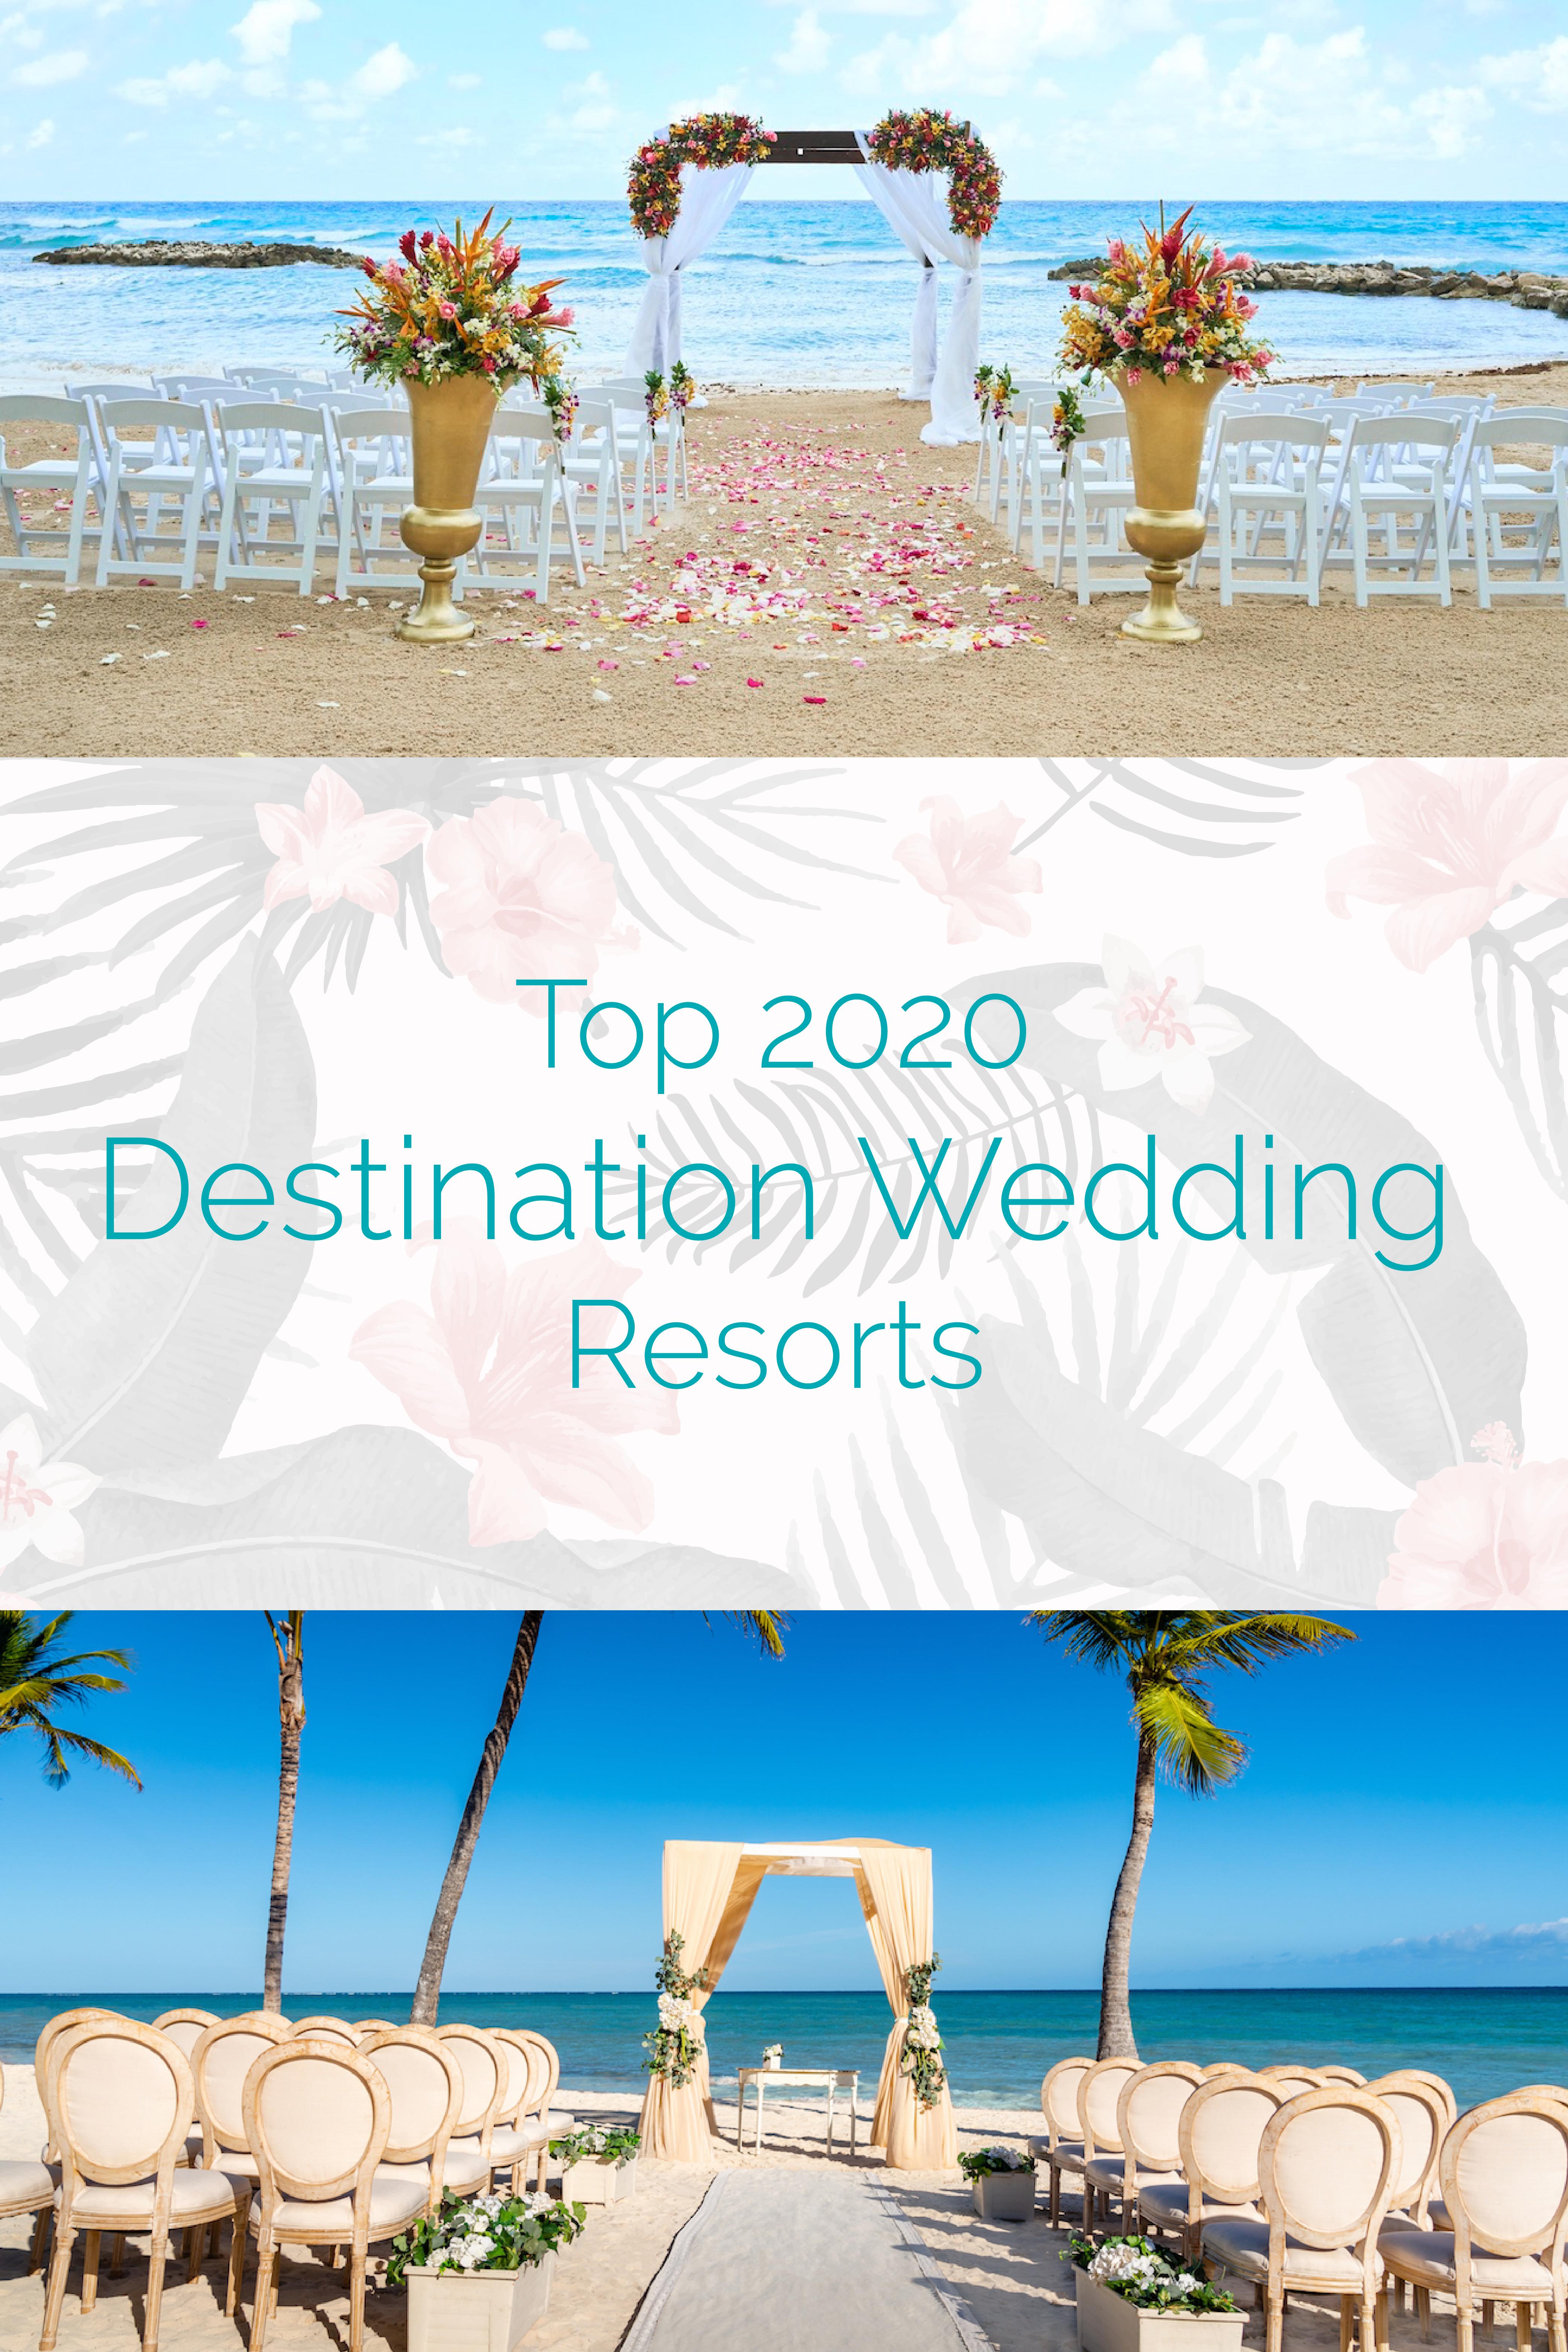 Top Destination Wedding Resorts For 2020 Destify Destination Wedding Locations Beach Destination Wedding Resort Beach Destination Wedding